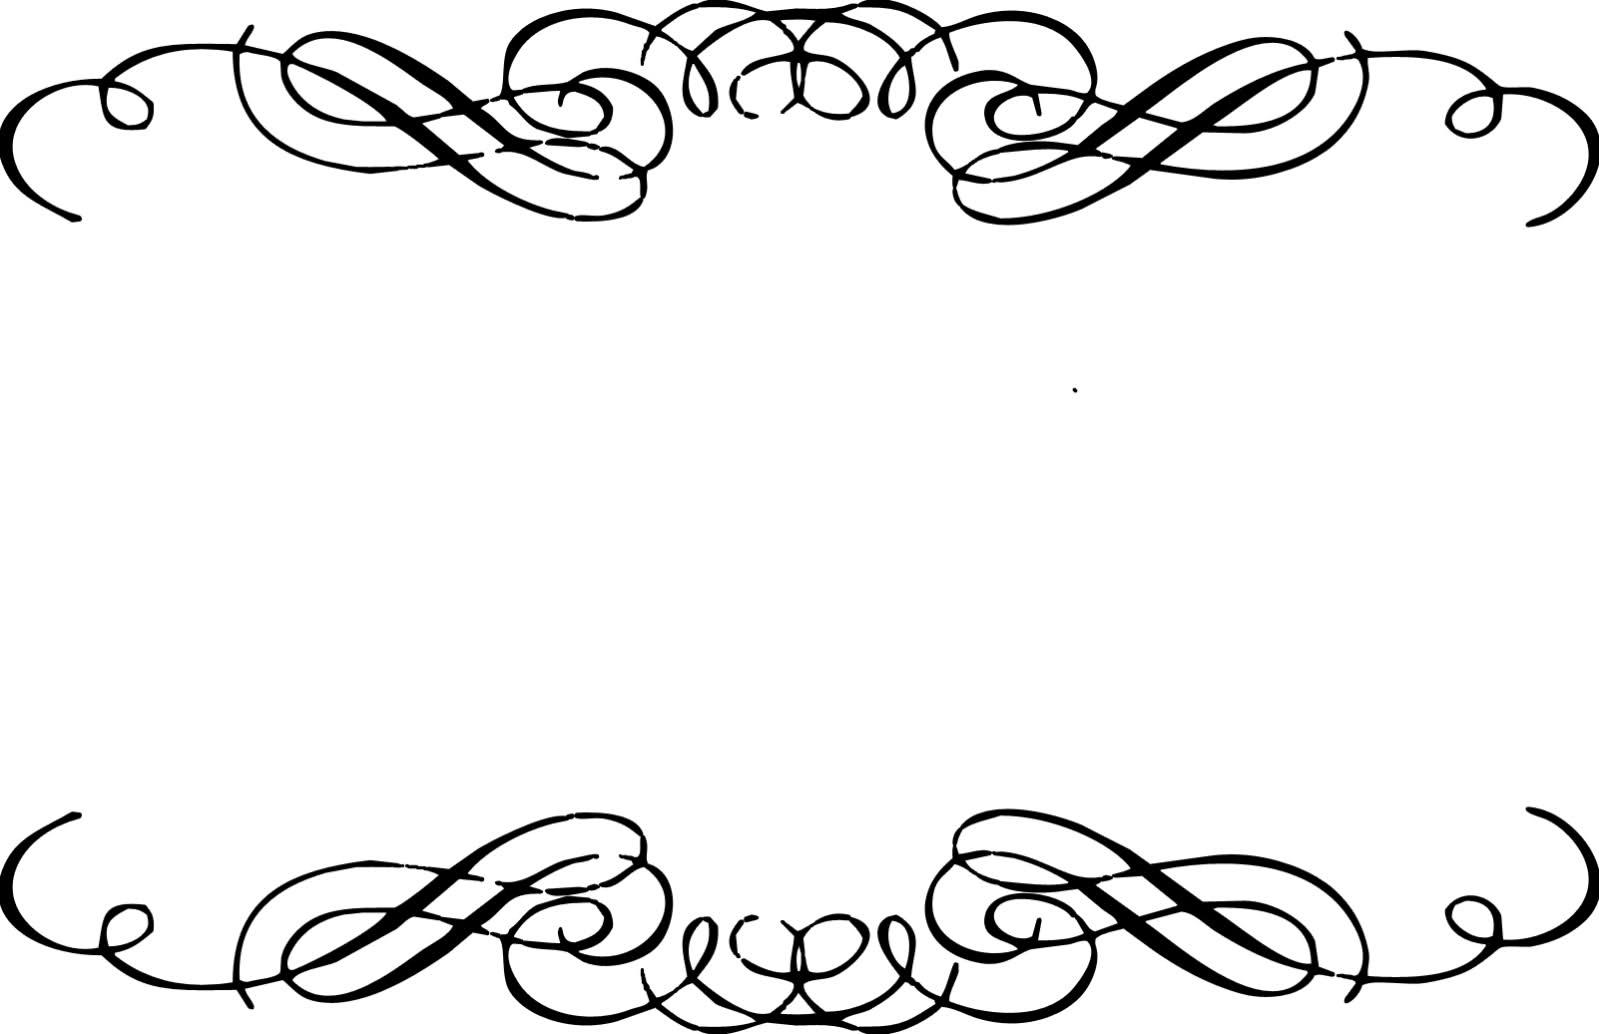 1599x1034 Border Swirls Cliparts 183374